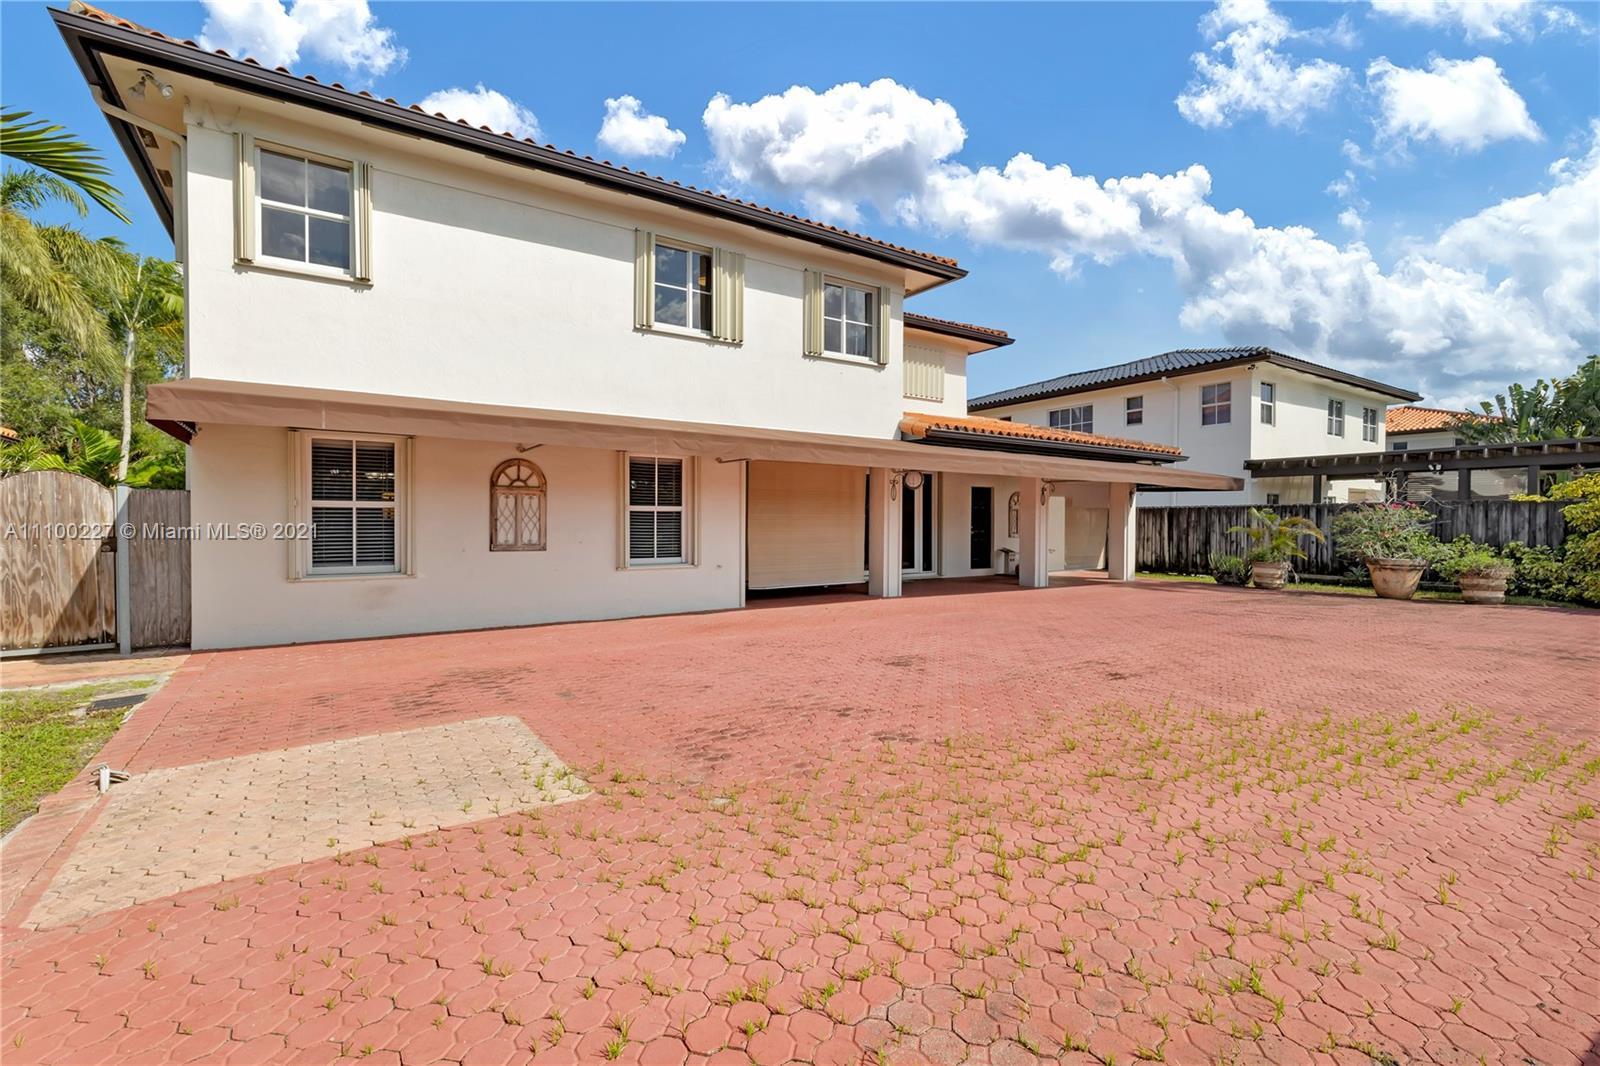 Single Family Home,For Sale,601 S Mashta Dr, Key Biscayne, Florida 33149,Brickell,realty,broker,condos near me